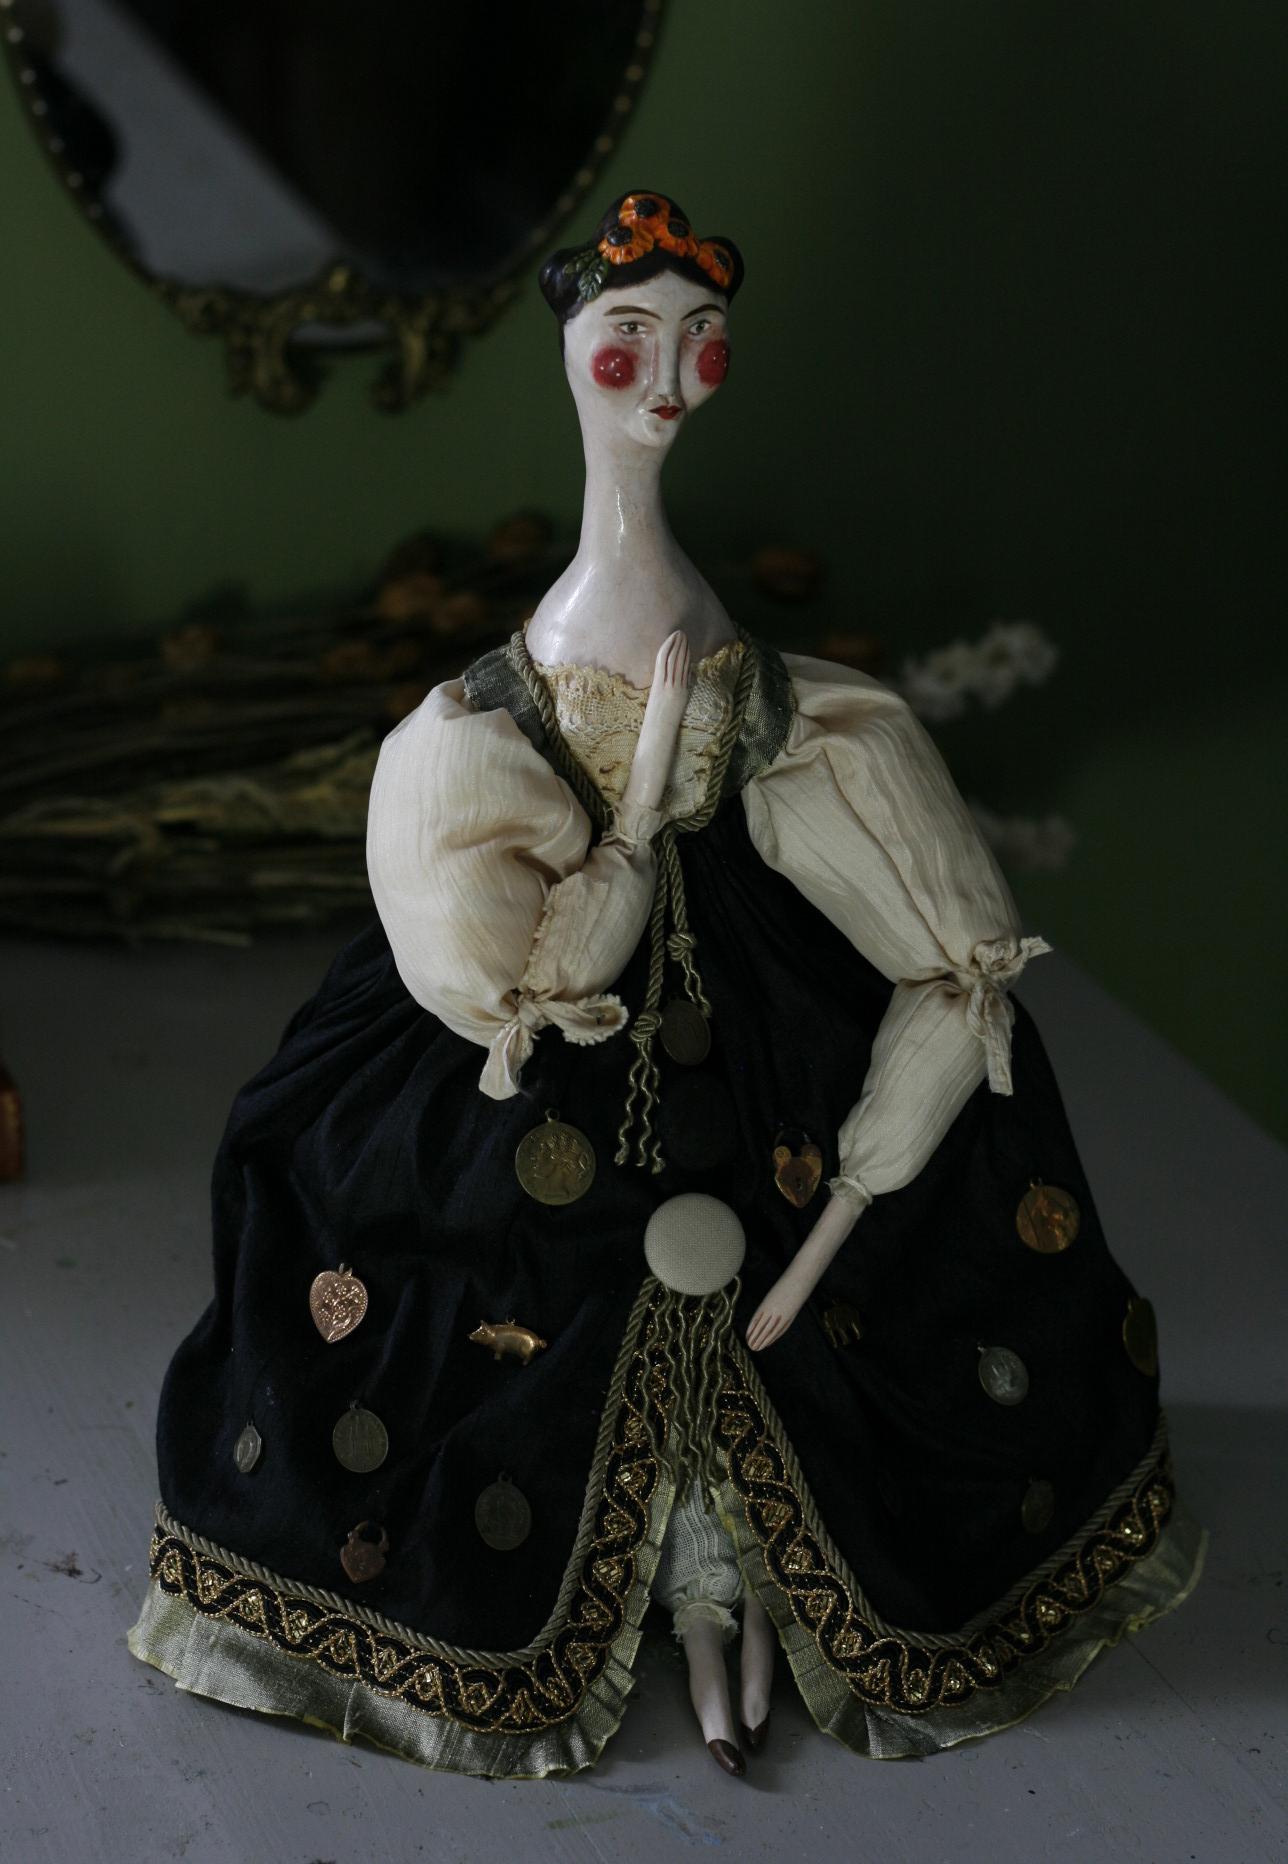 Lady Peregrine